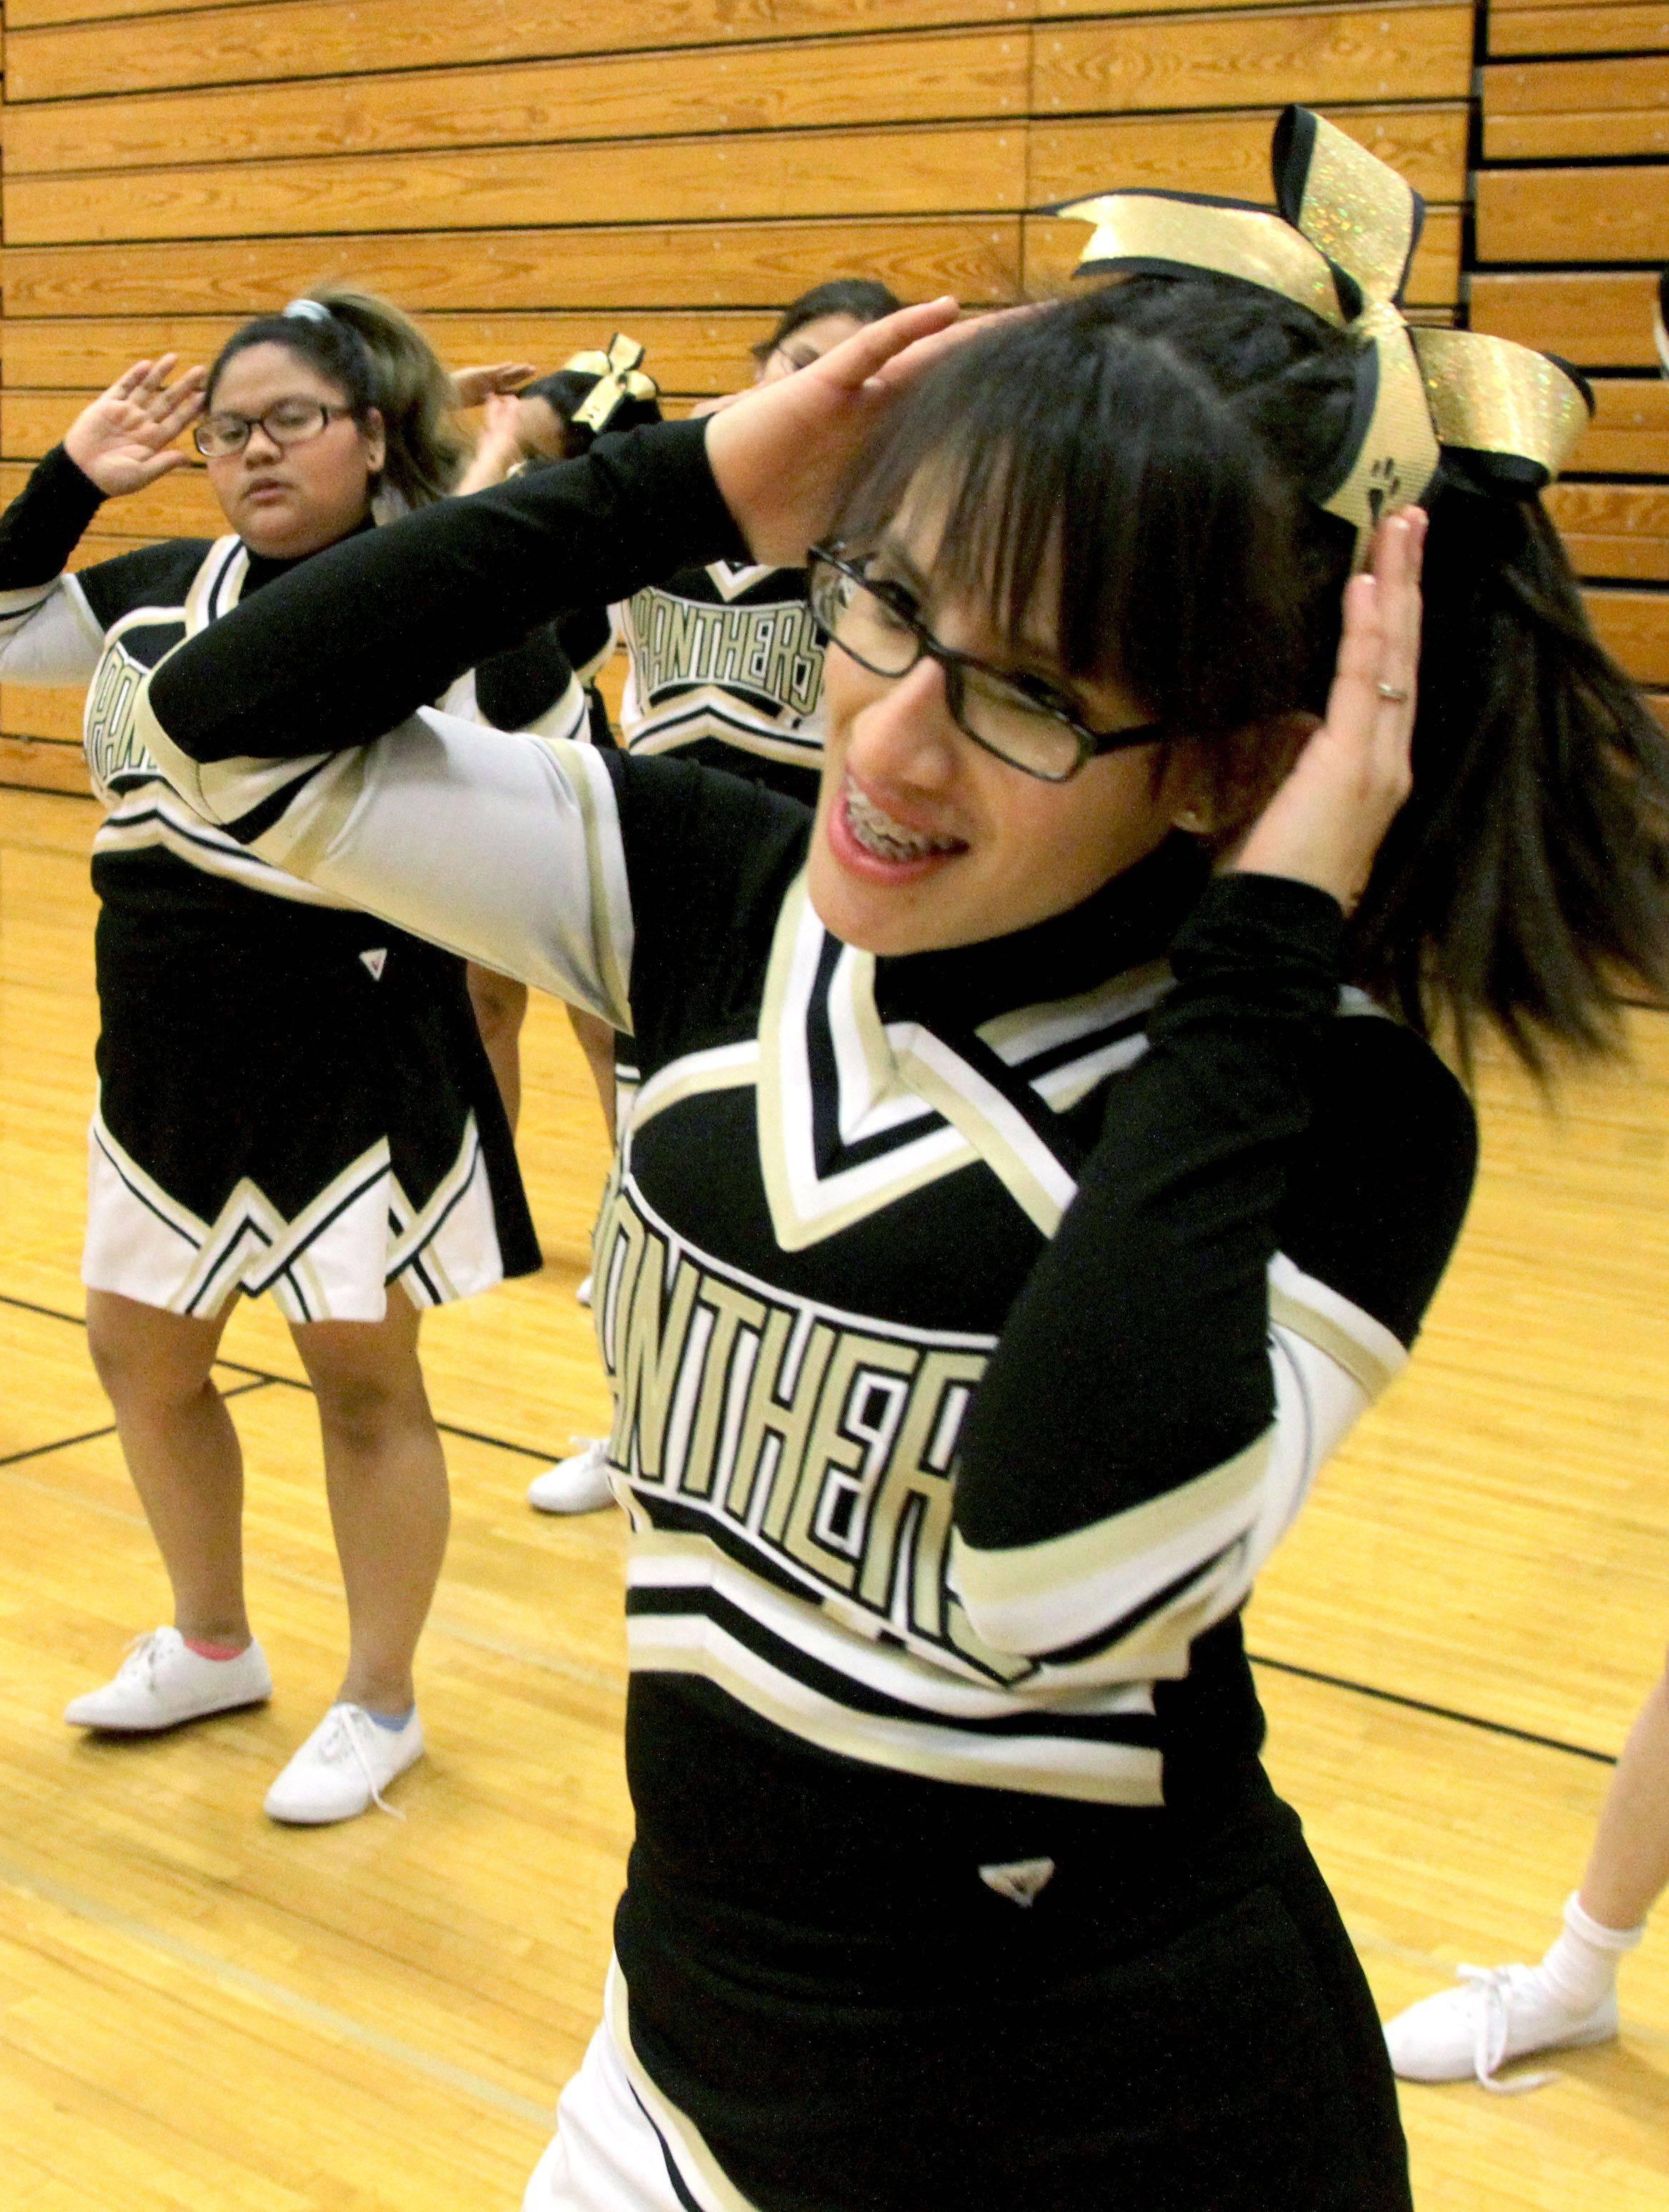 Youth Running Shorts Luz Girl Cheer Practice Shorts